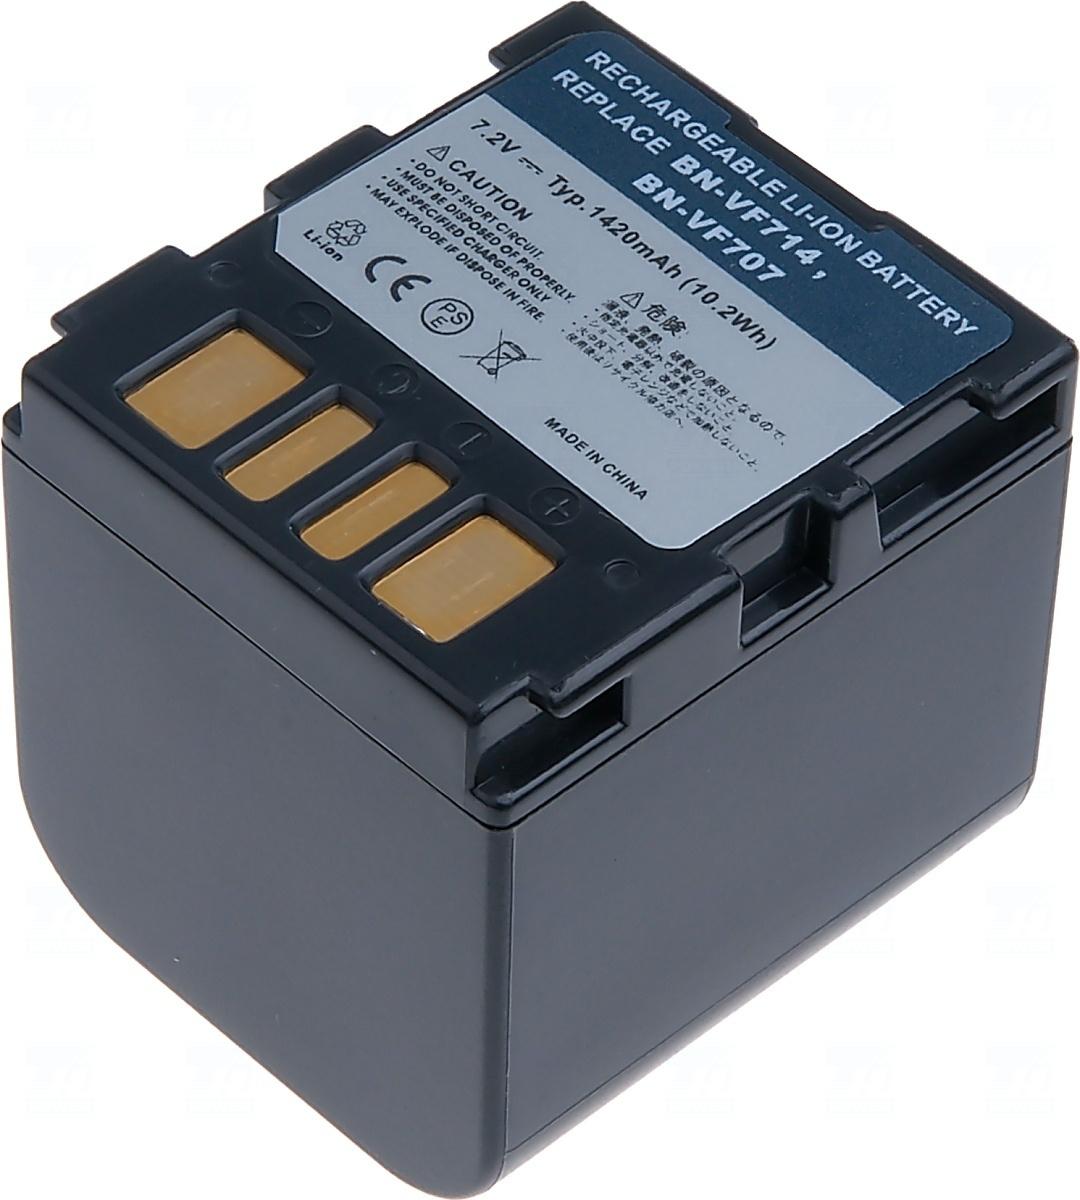 Baterie T6 power BN-VF707U, BN-VF707, BN-VF714, BN-VF707US, BN-VF707UE, BN-VF714U, BN-VF714US, BN-VF714UE, LY34647-002B, šedá